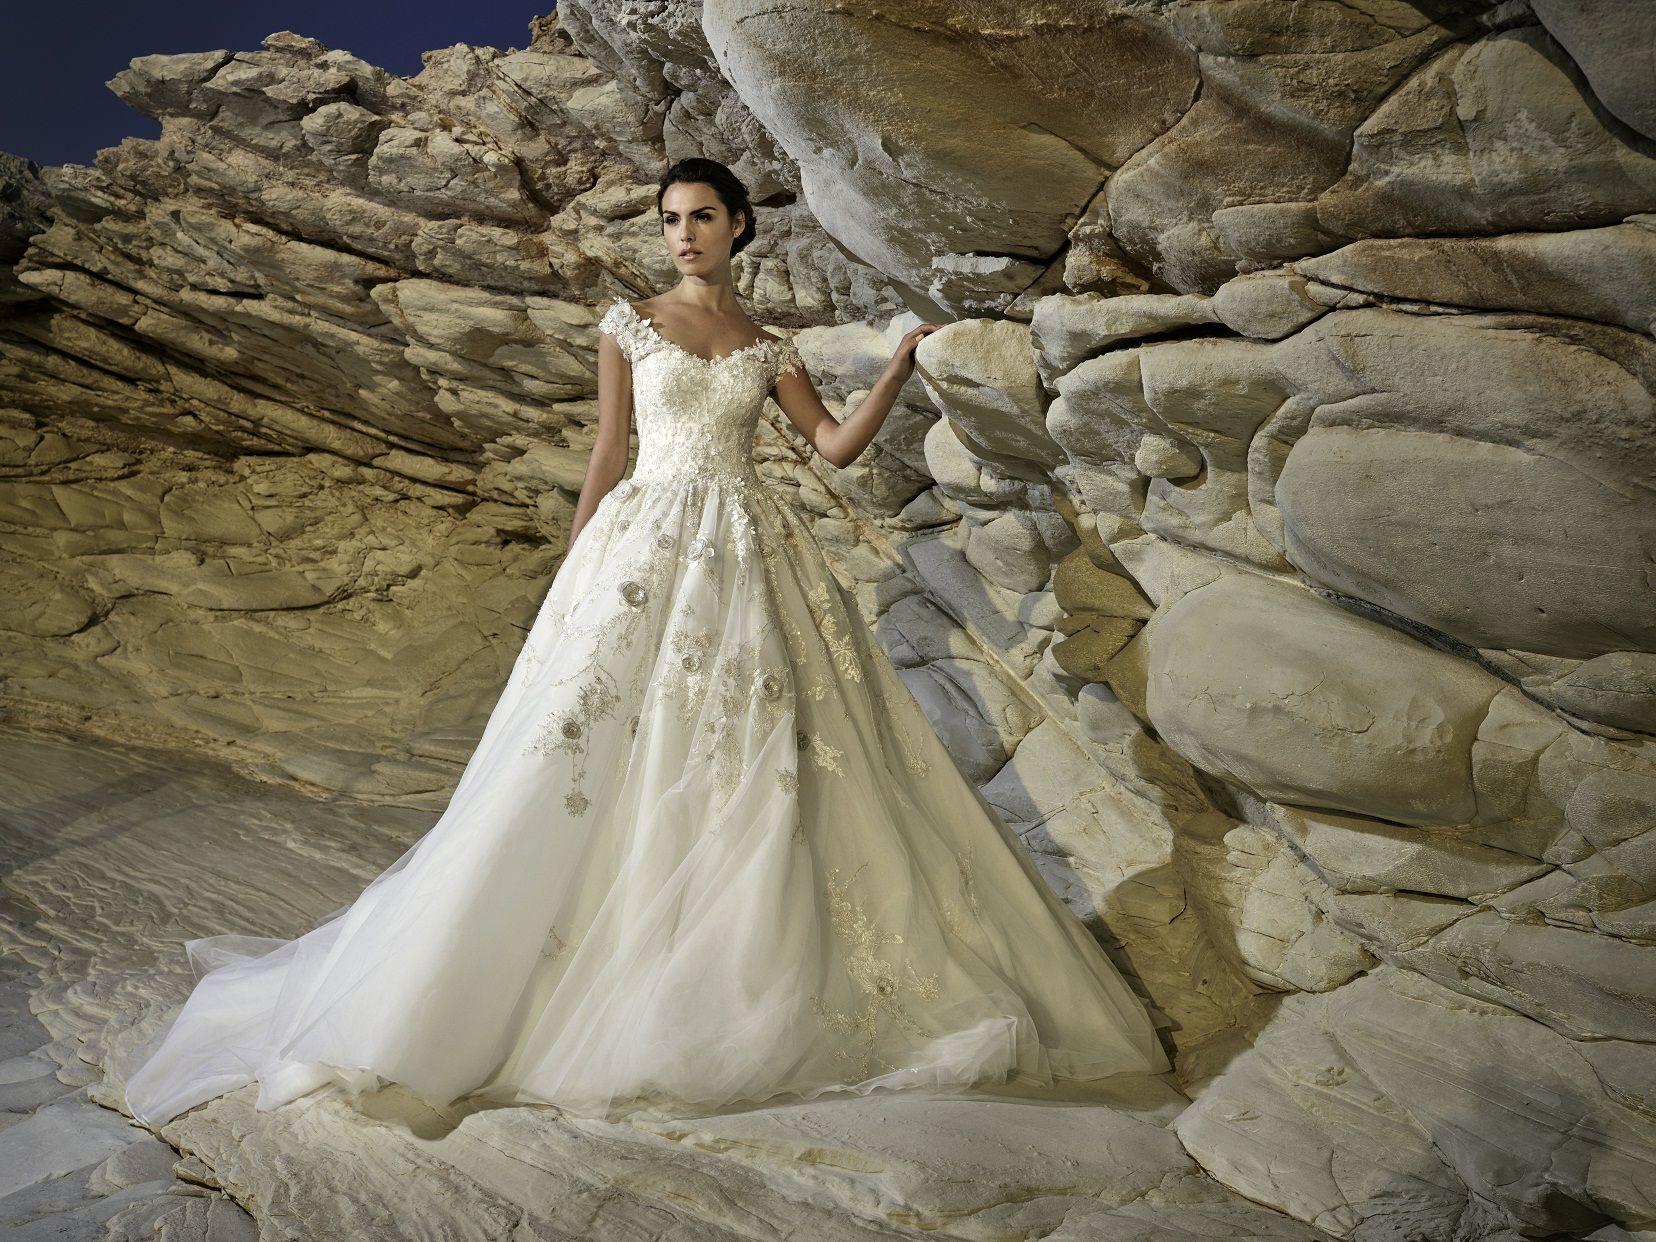 wedding #bridal #newcollection #bride #bridaldress #weddingdress ...